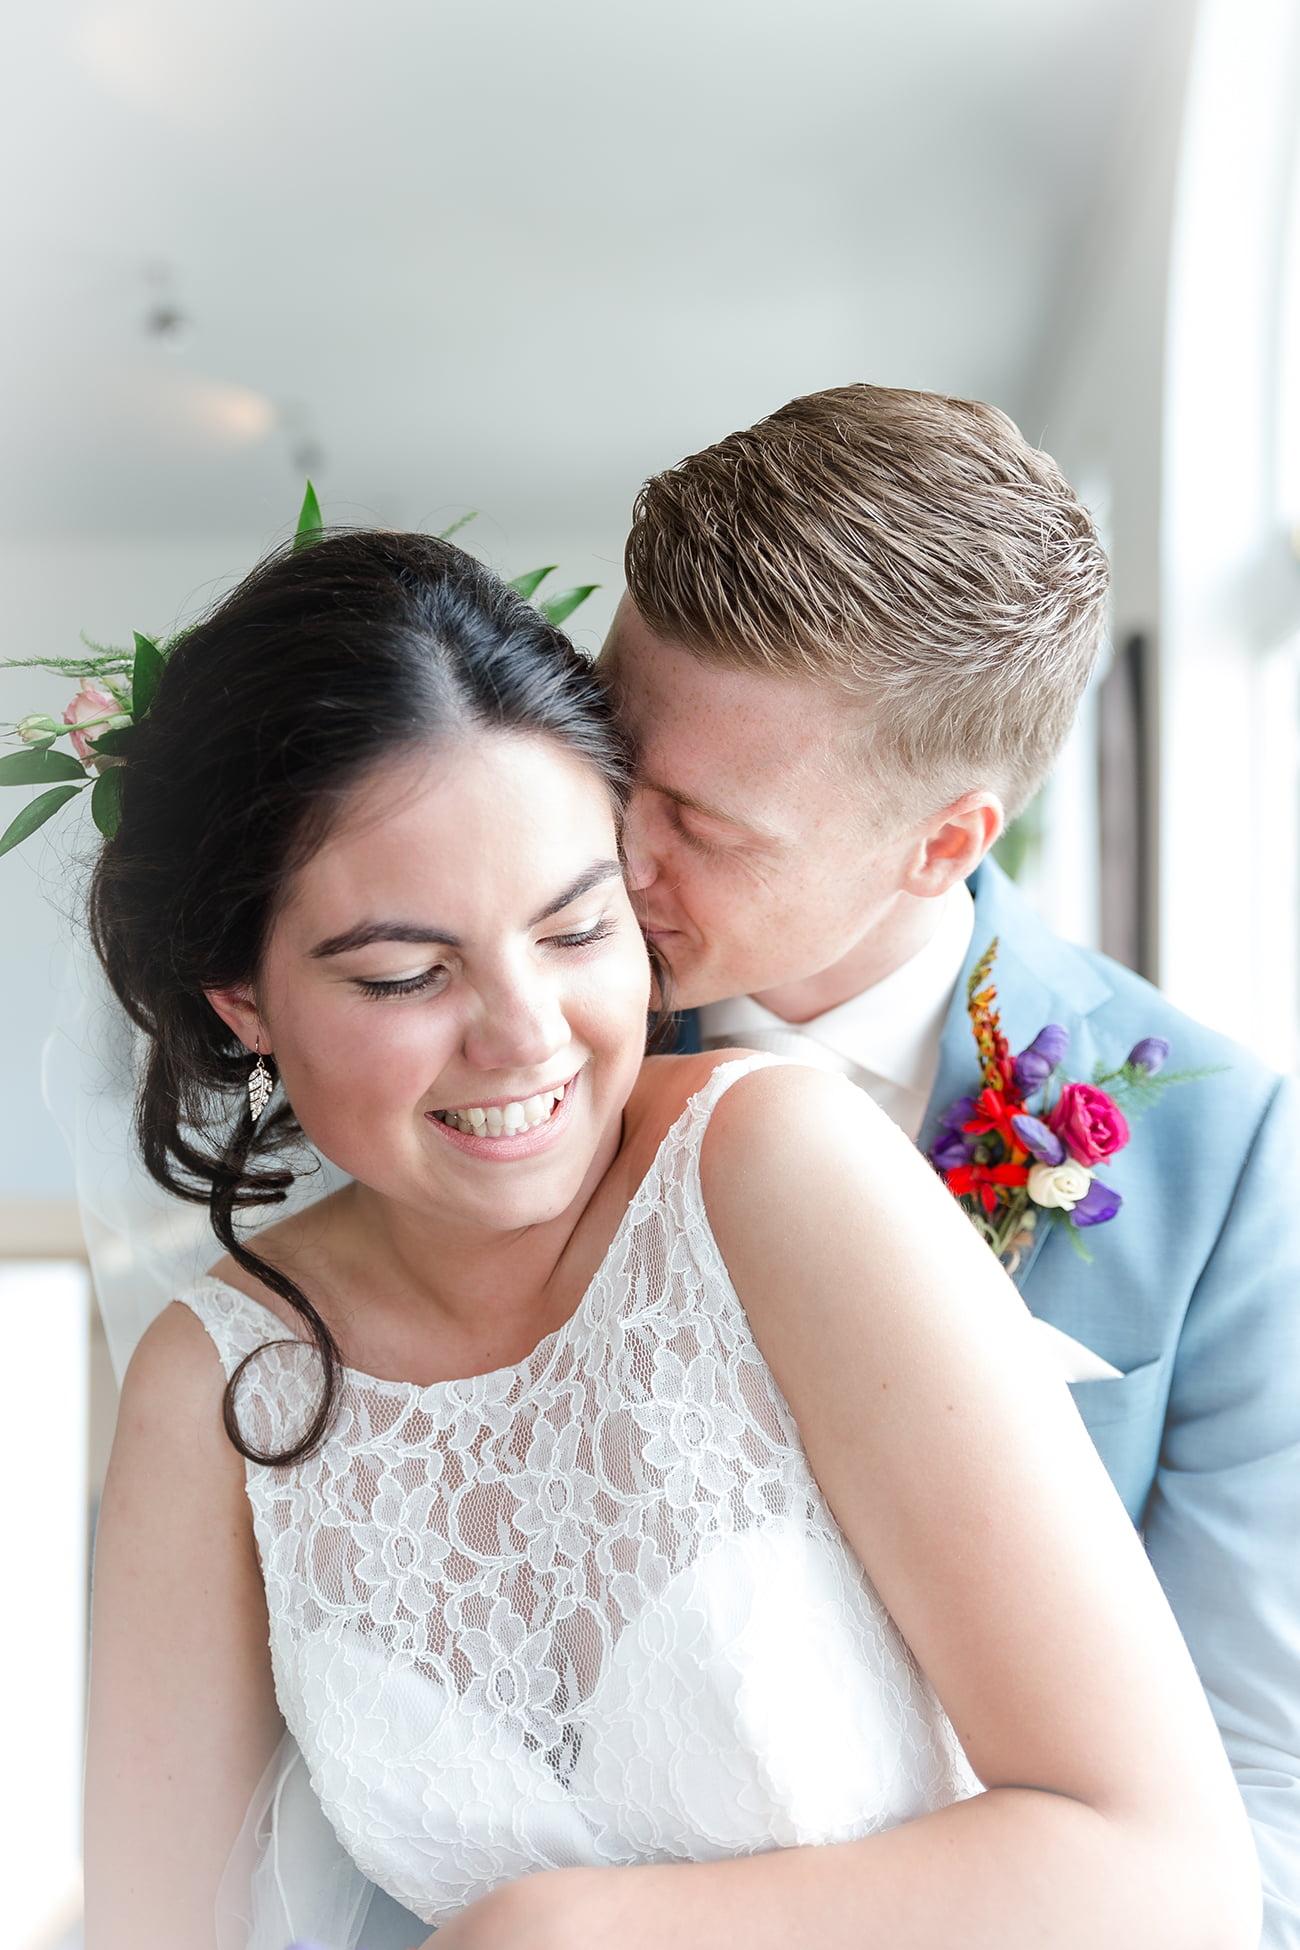 Huwelijks fotografie Bruidsportretten trouwen © Quo Fotografie